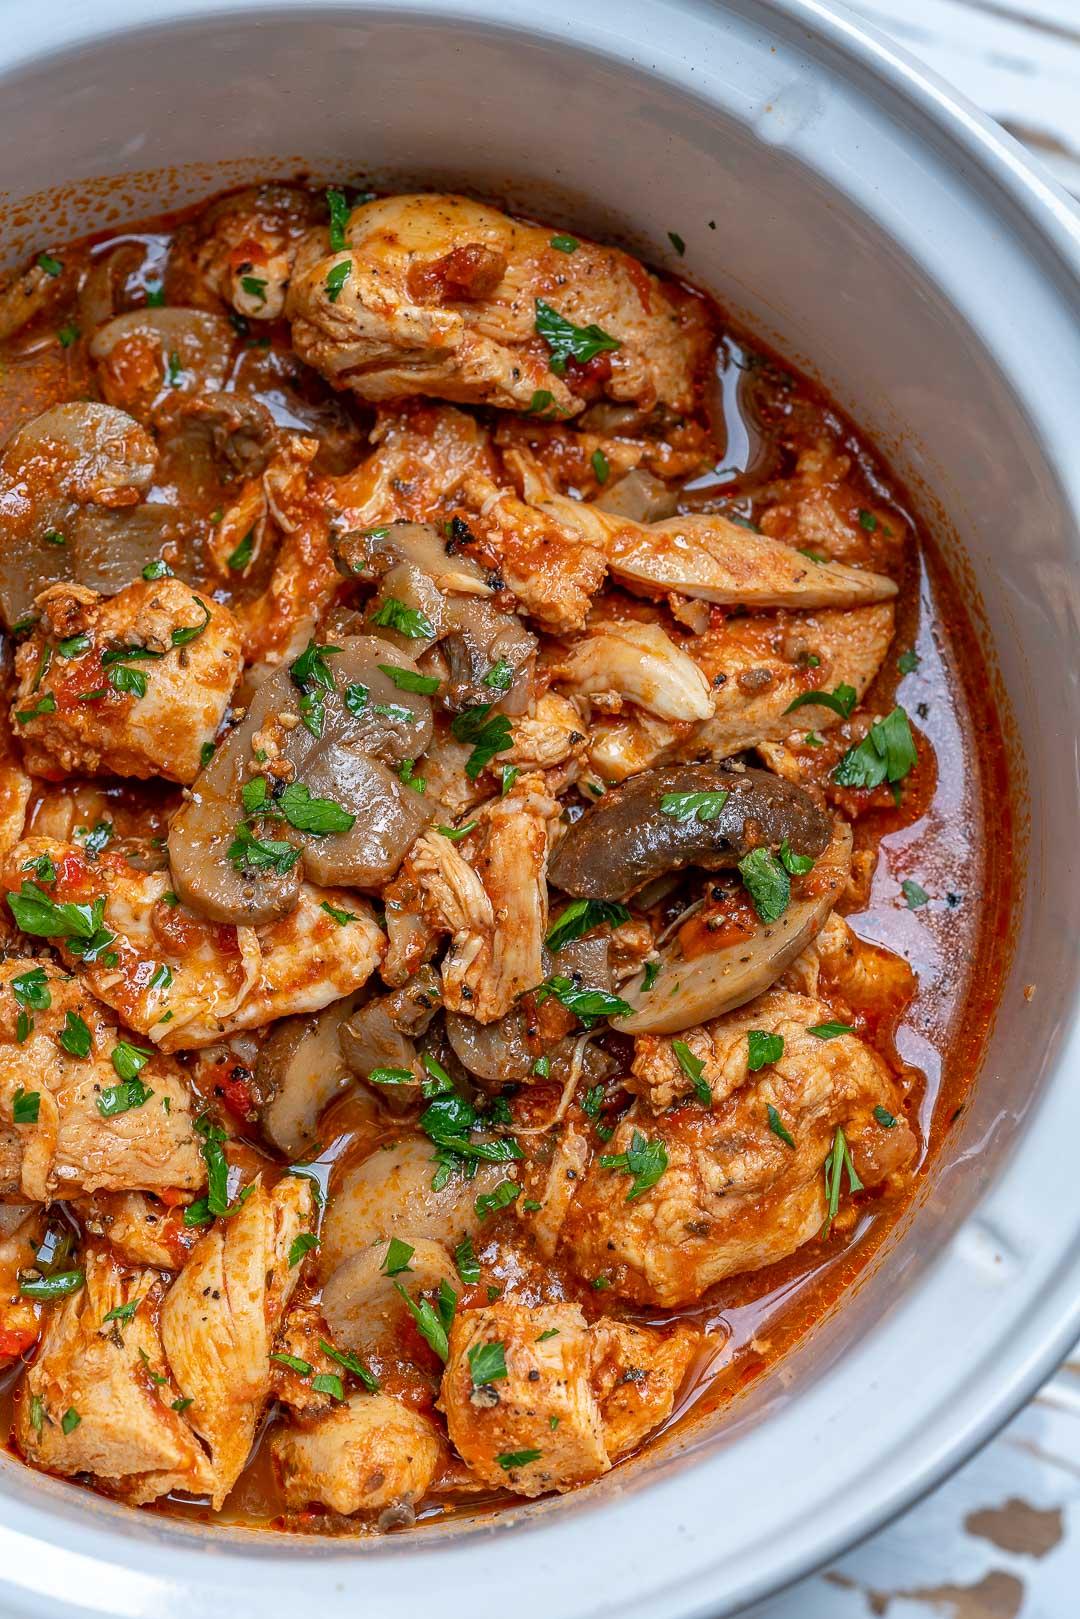 Crockpot Chicken With Mushrooms